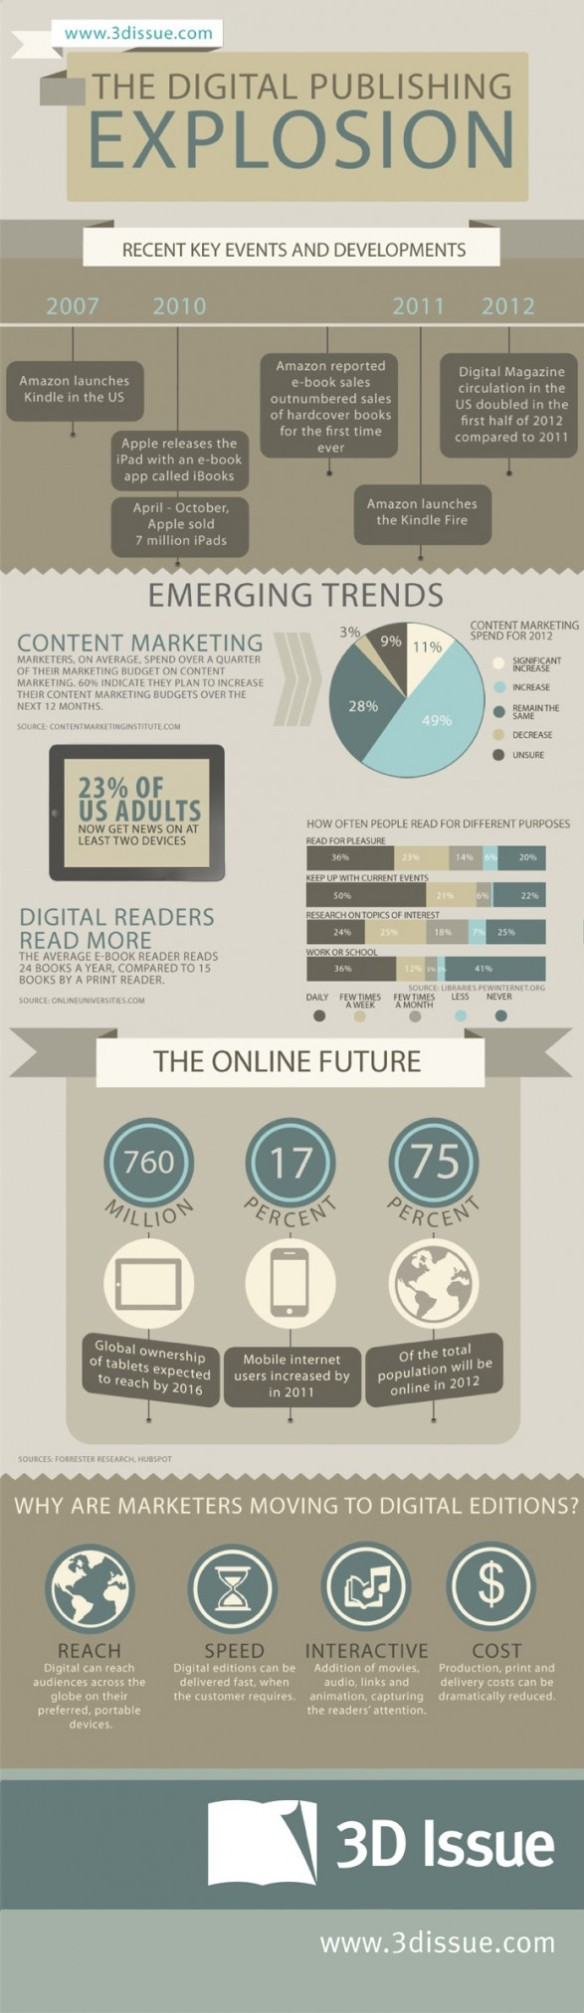 Digital Publishing Explosion